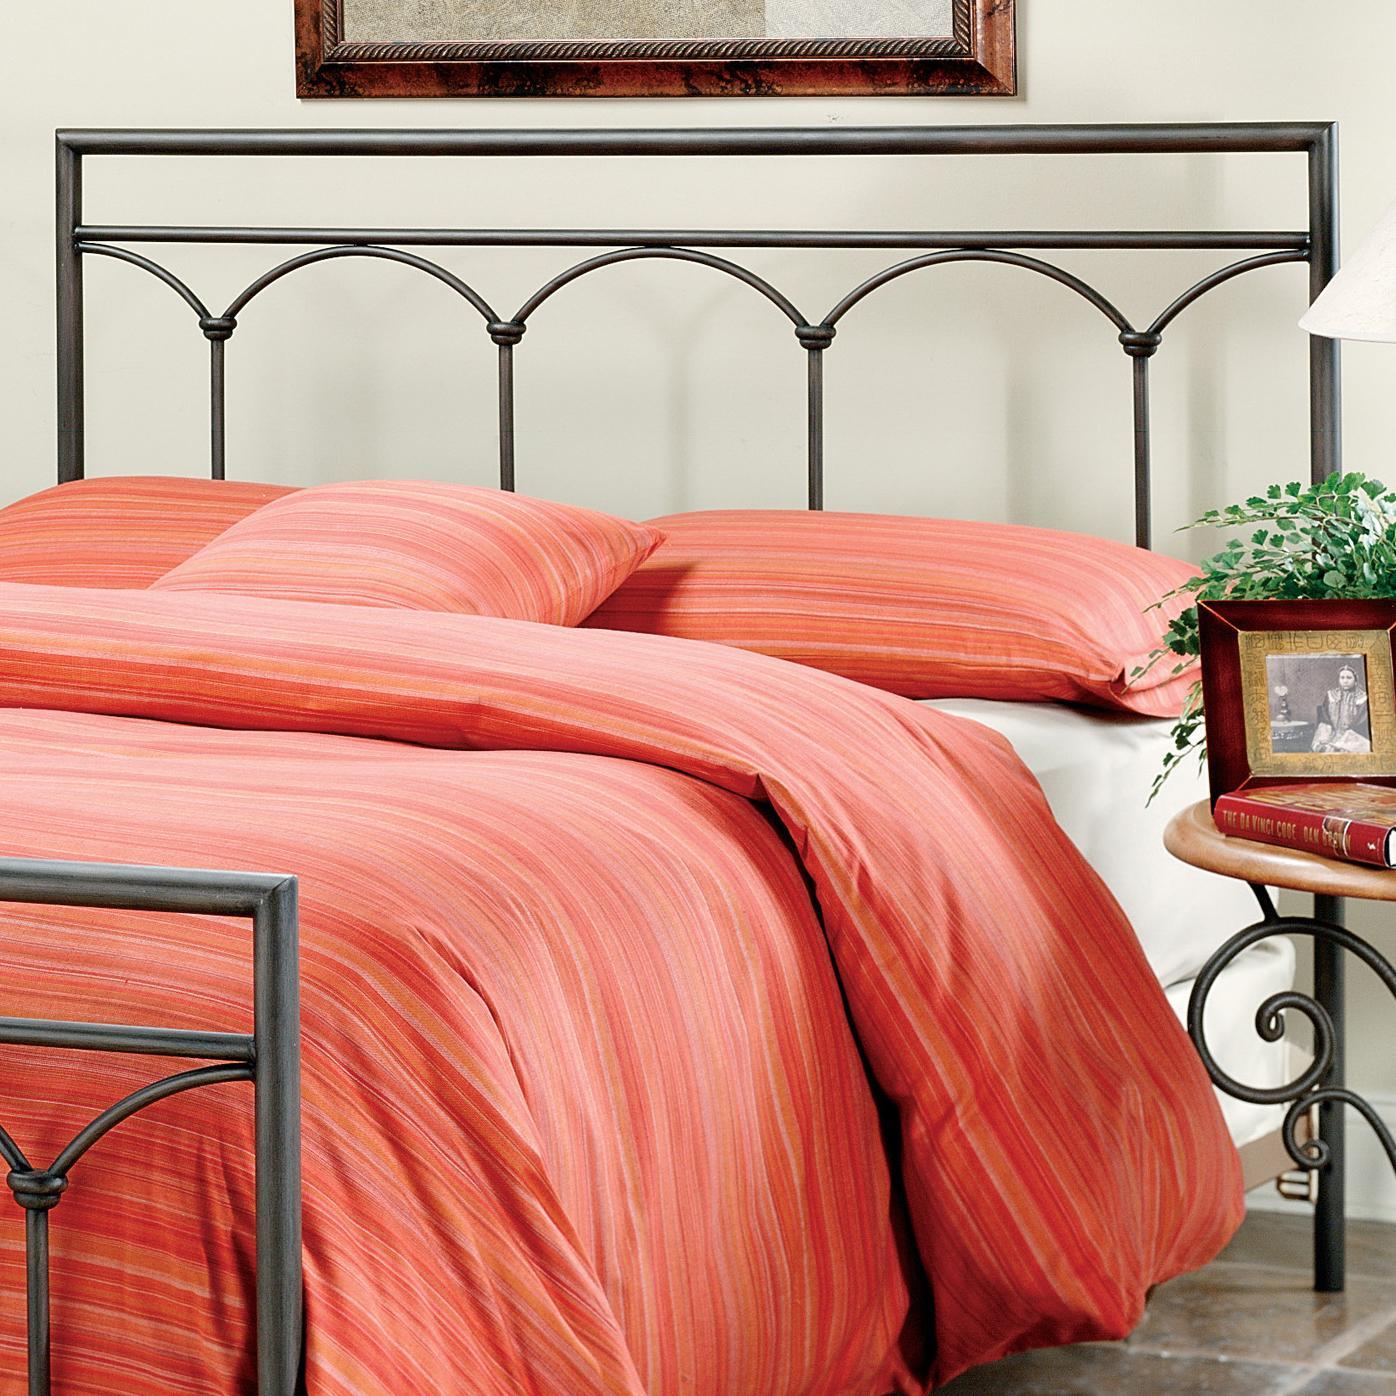 Metal Beds Full McKenzie Headboard by Hillsdale at Steger's Furniture